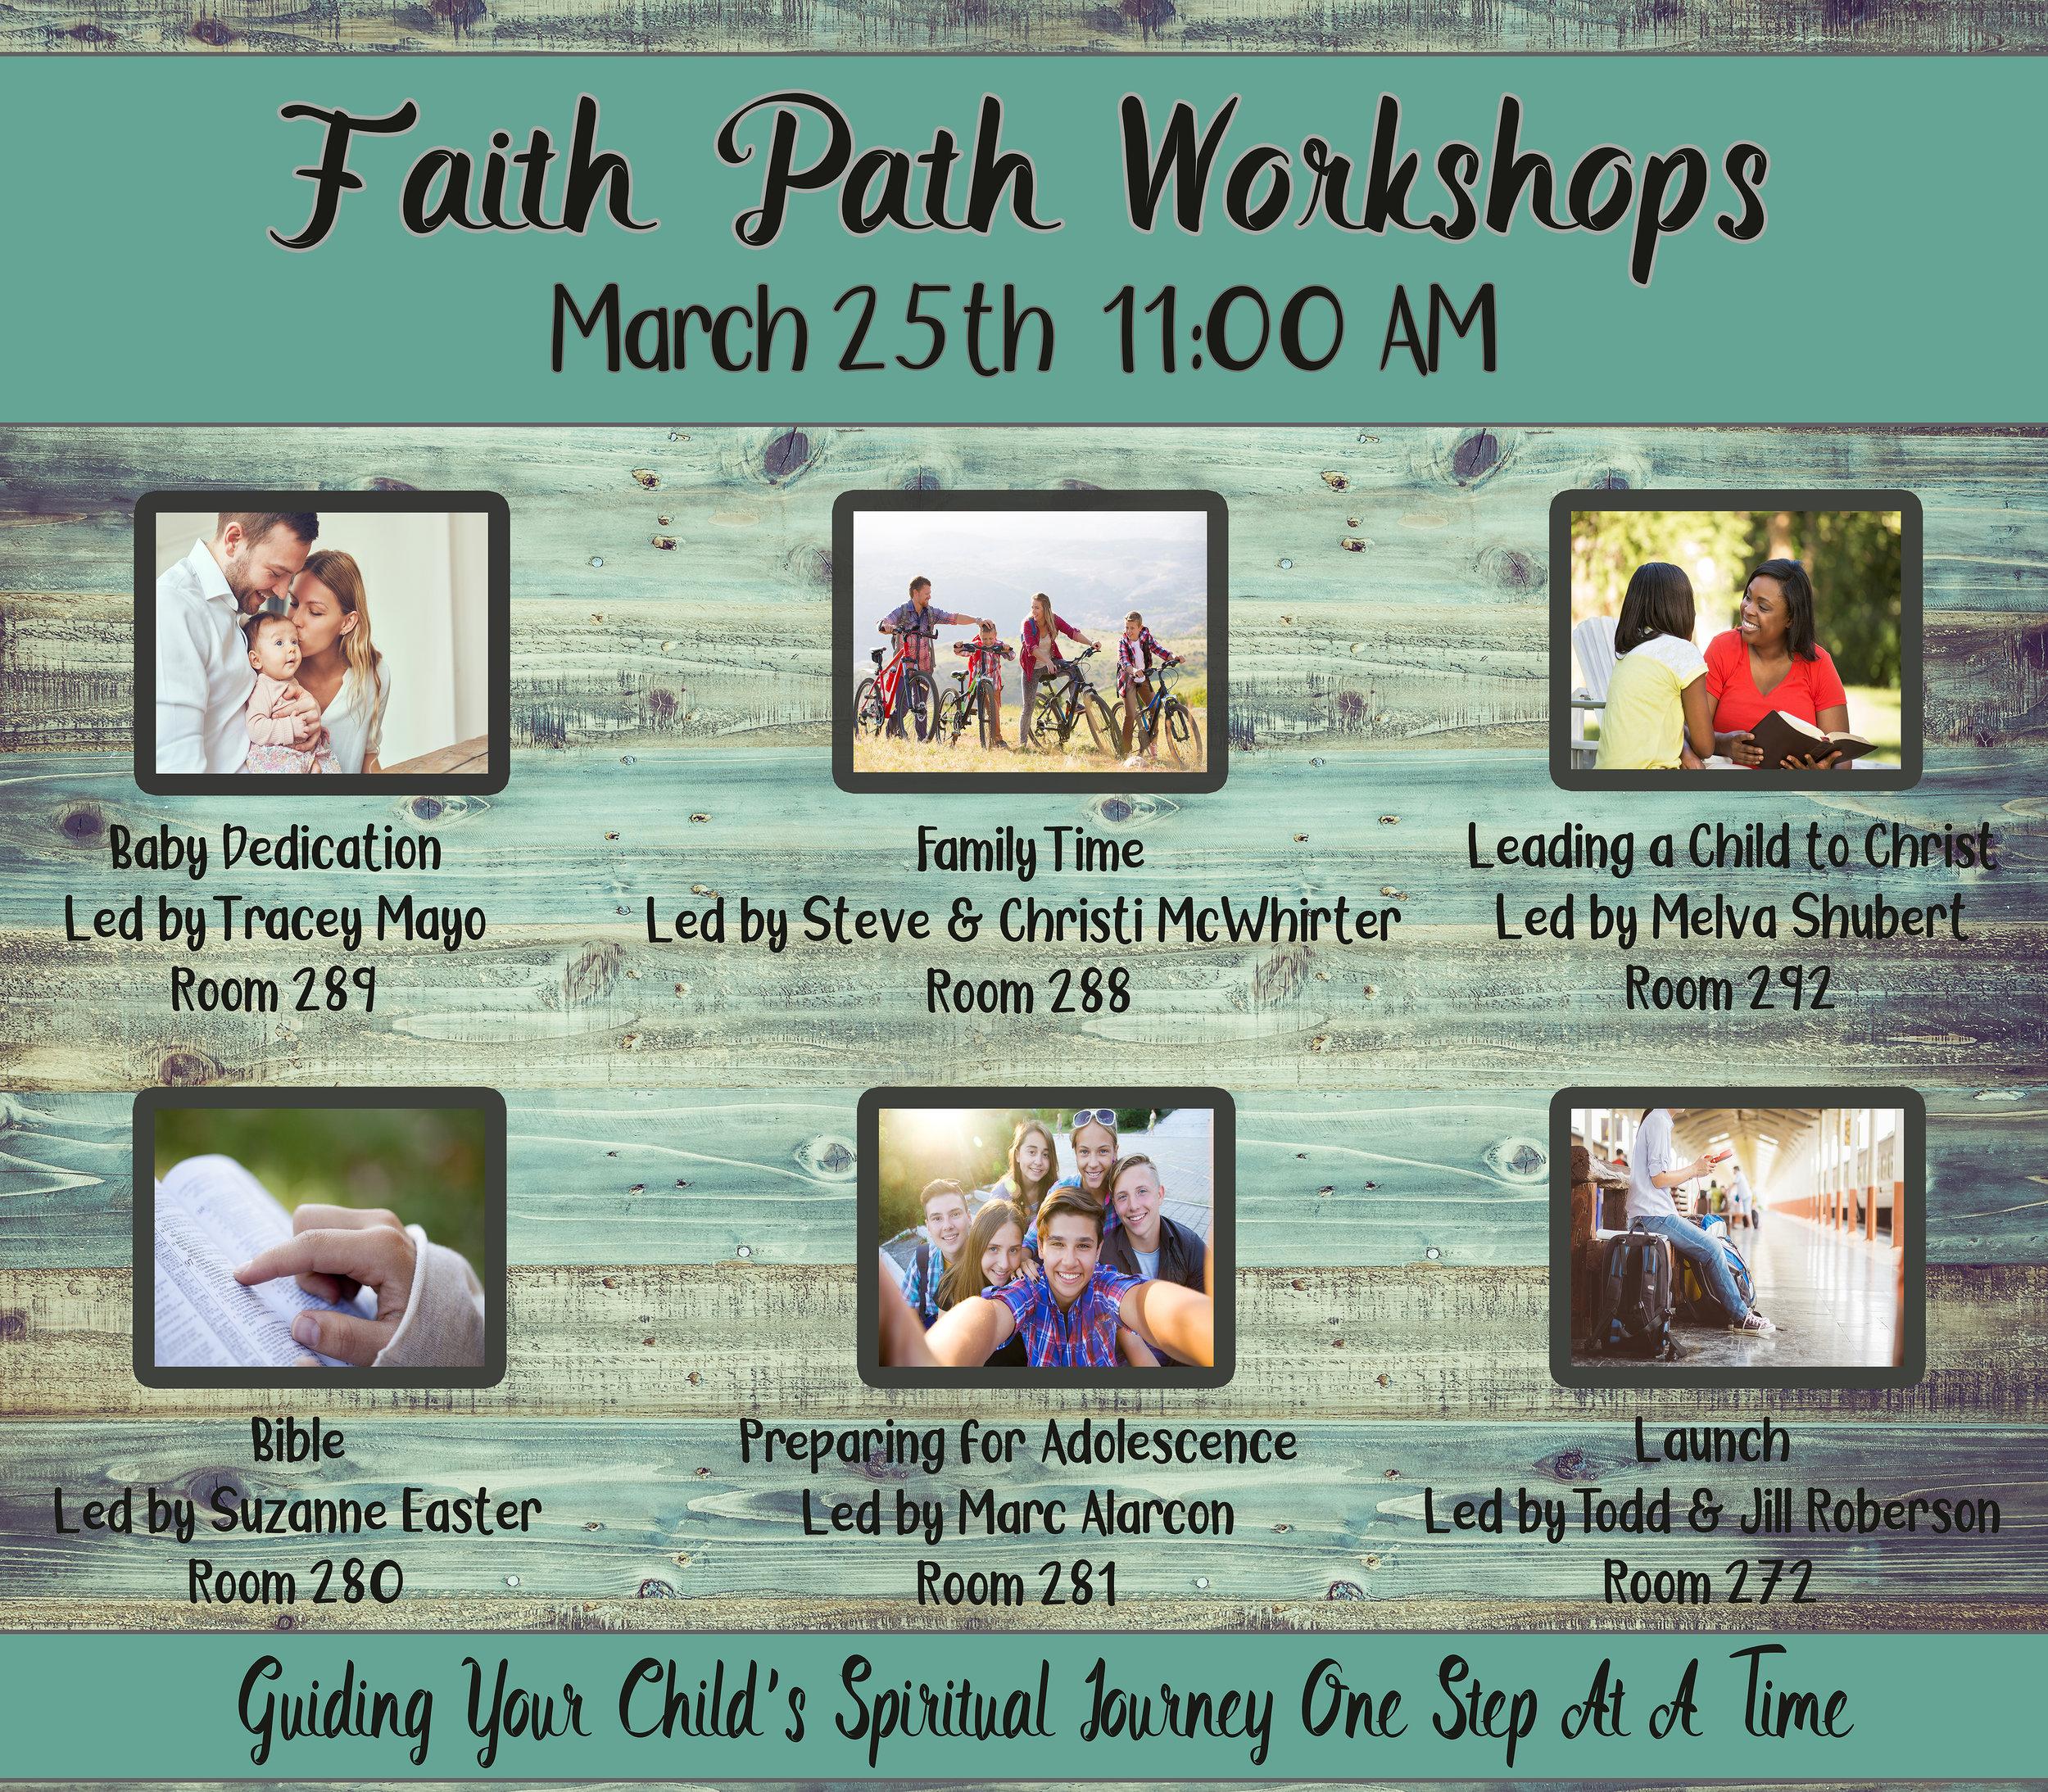 Faith Path Wkshp Poster Sm.jpg